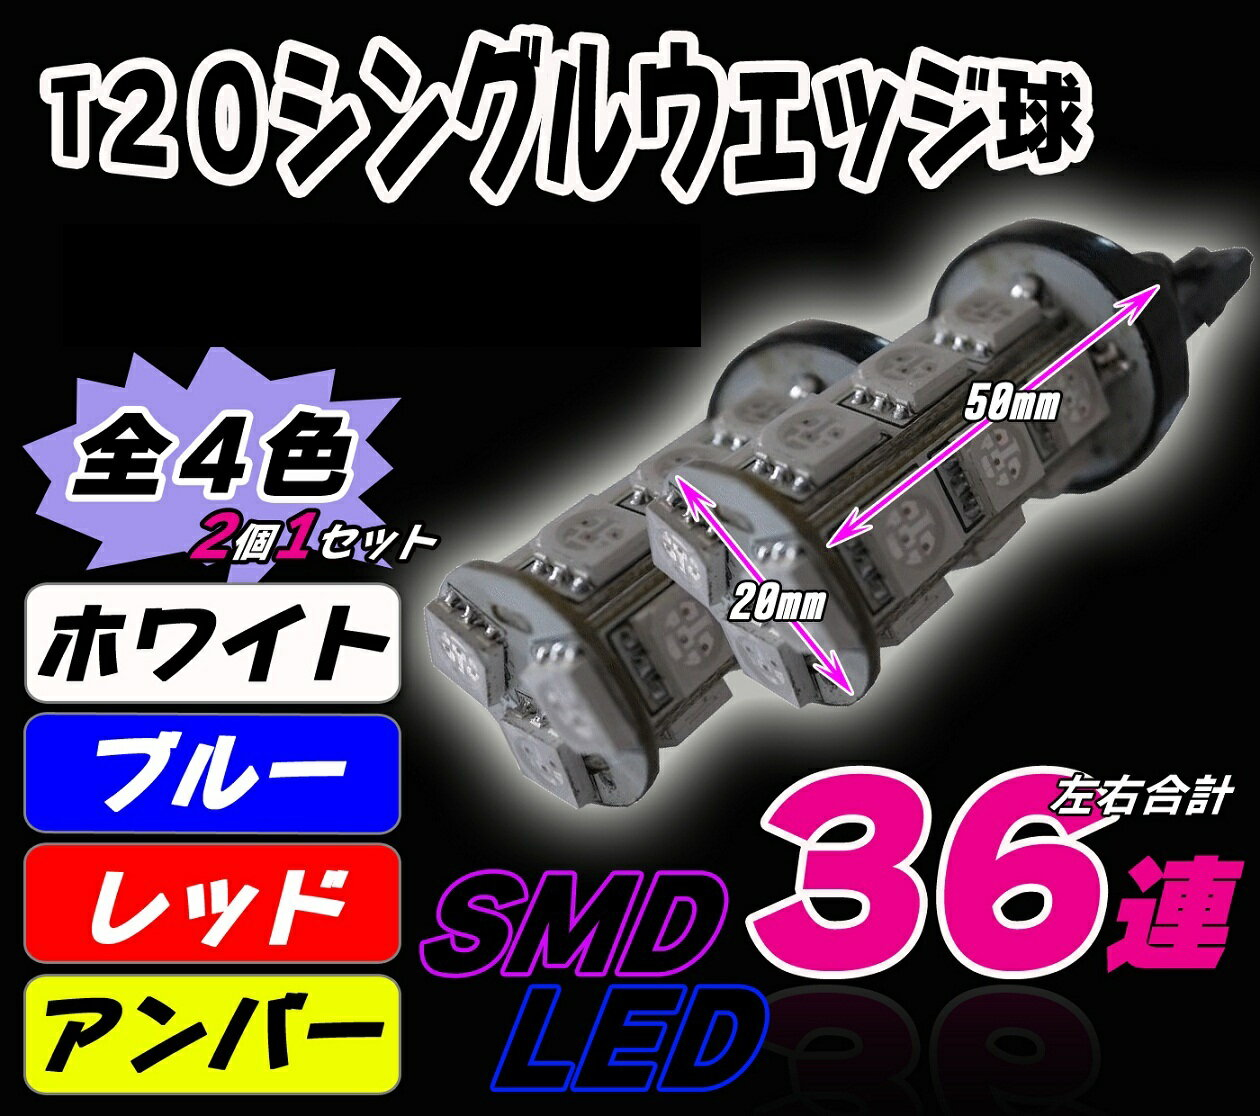 LED ledライト led電球 SMD ウェッジ球 T-20 シングル 36連 最安値に挑戦